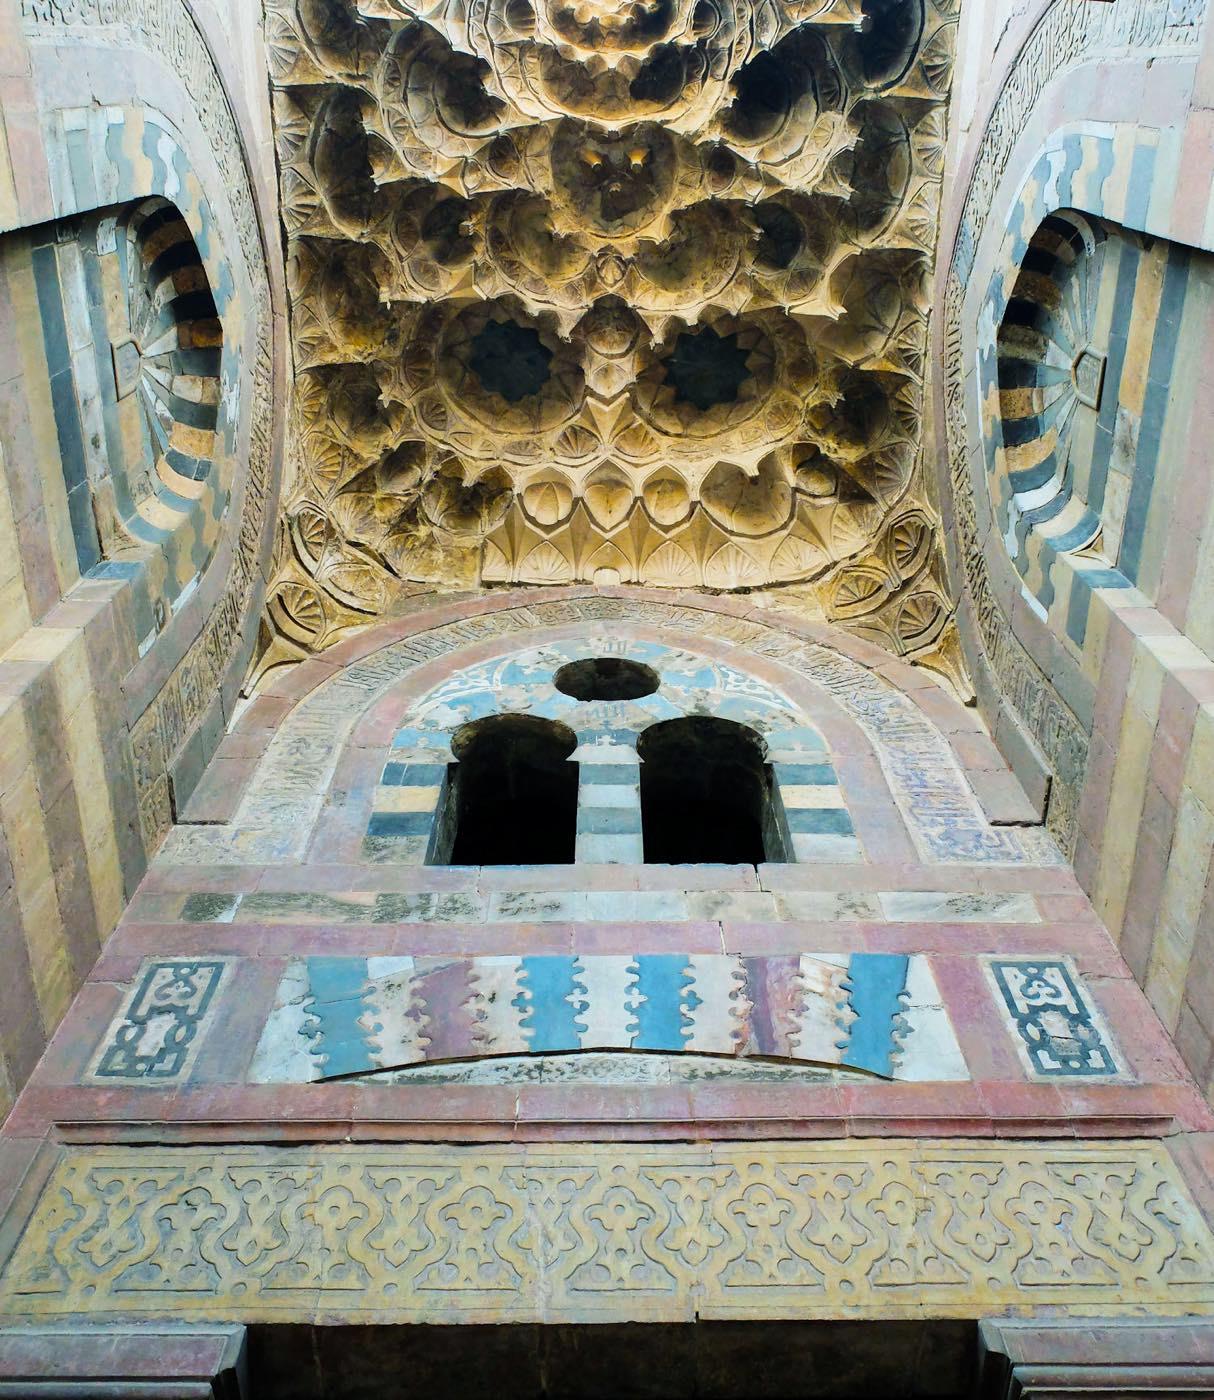 Eingangsportal, Madrasa, Moschee, Kairo, Umm al Sultan Sha'ban,